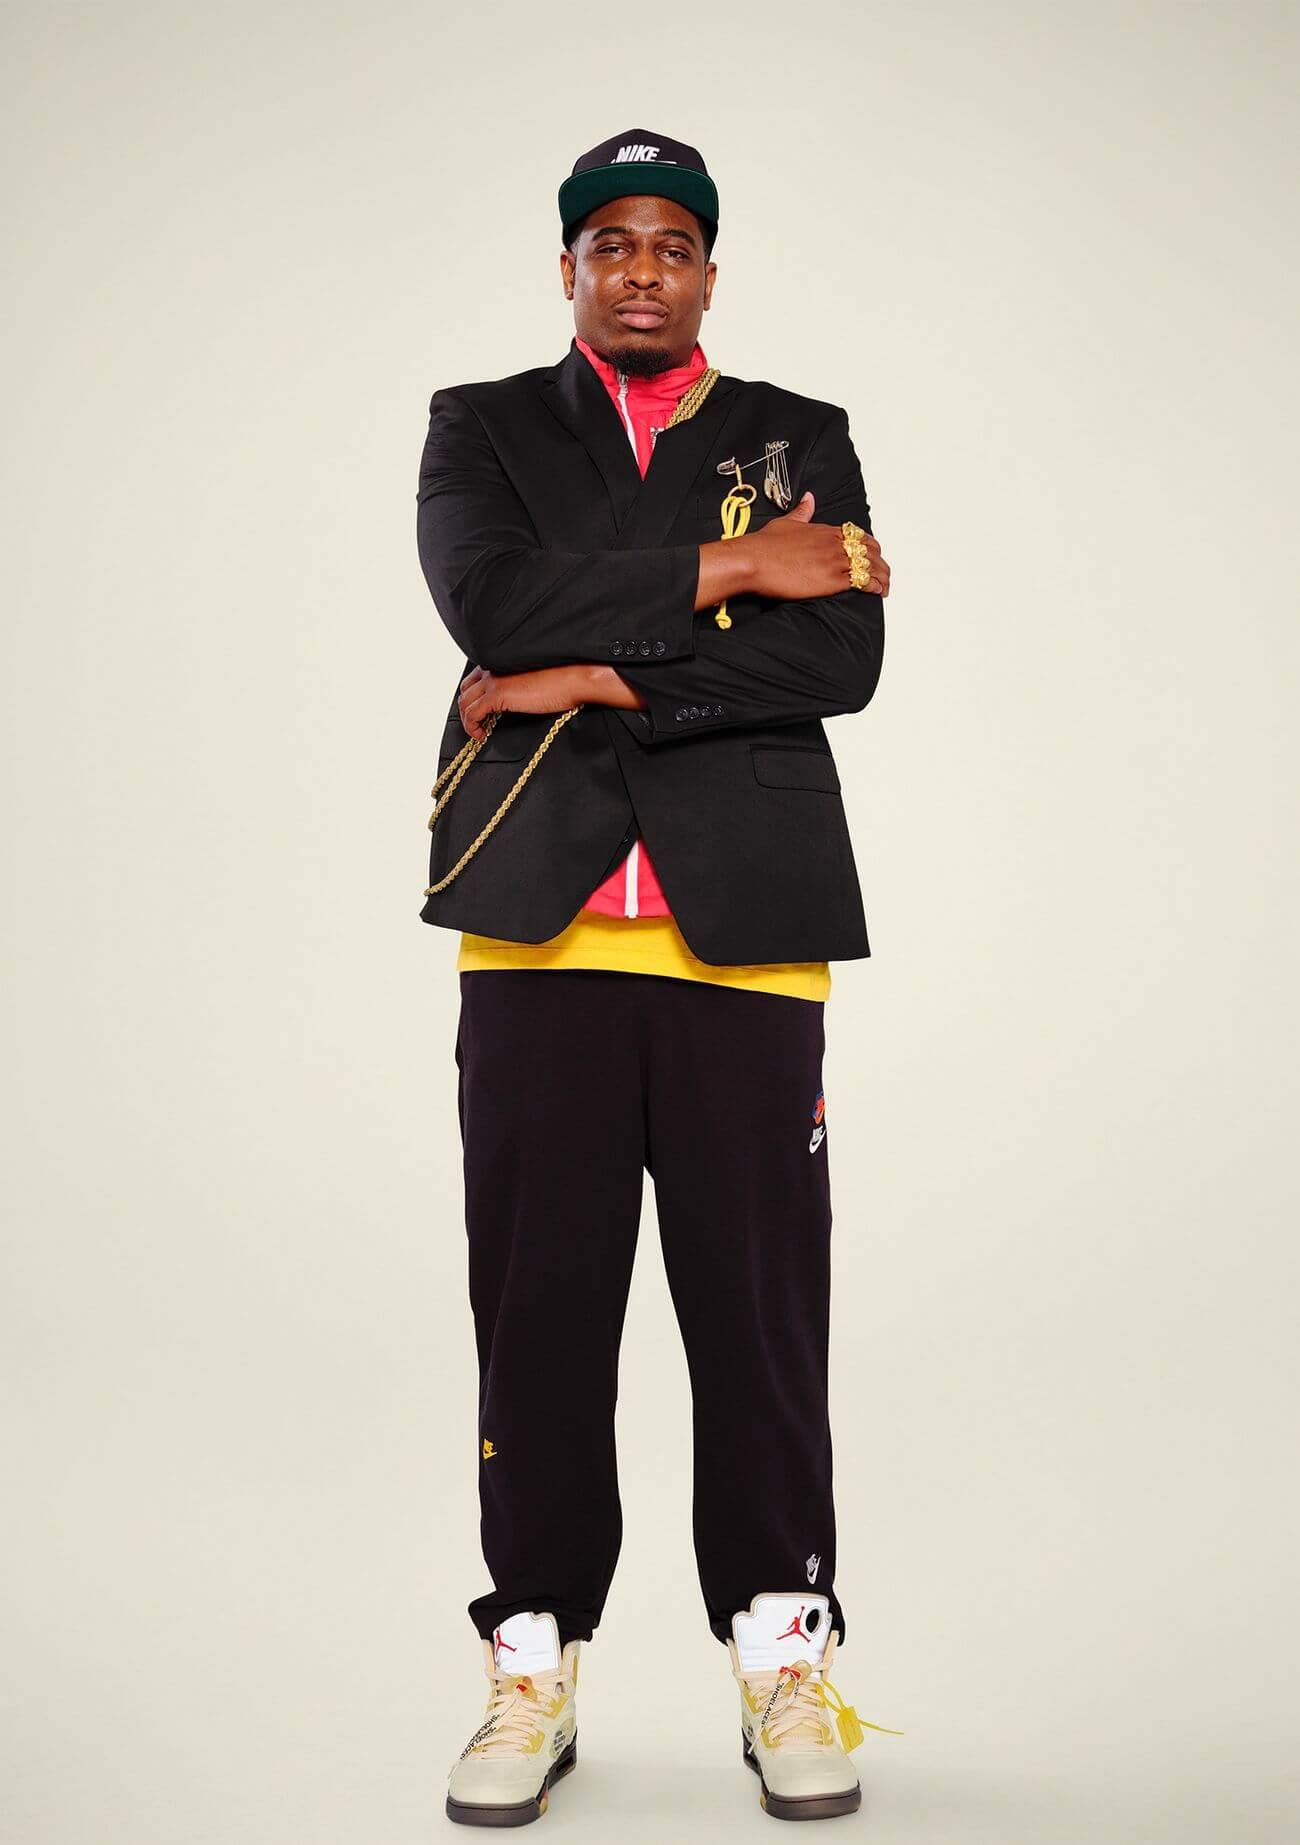 Toussaint King, Footwear Design /Serena Williams Design Crew (SWDC)